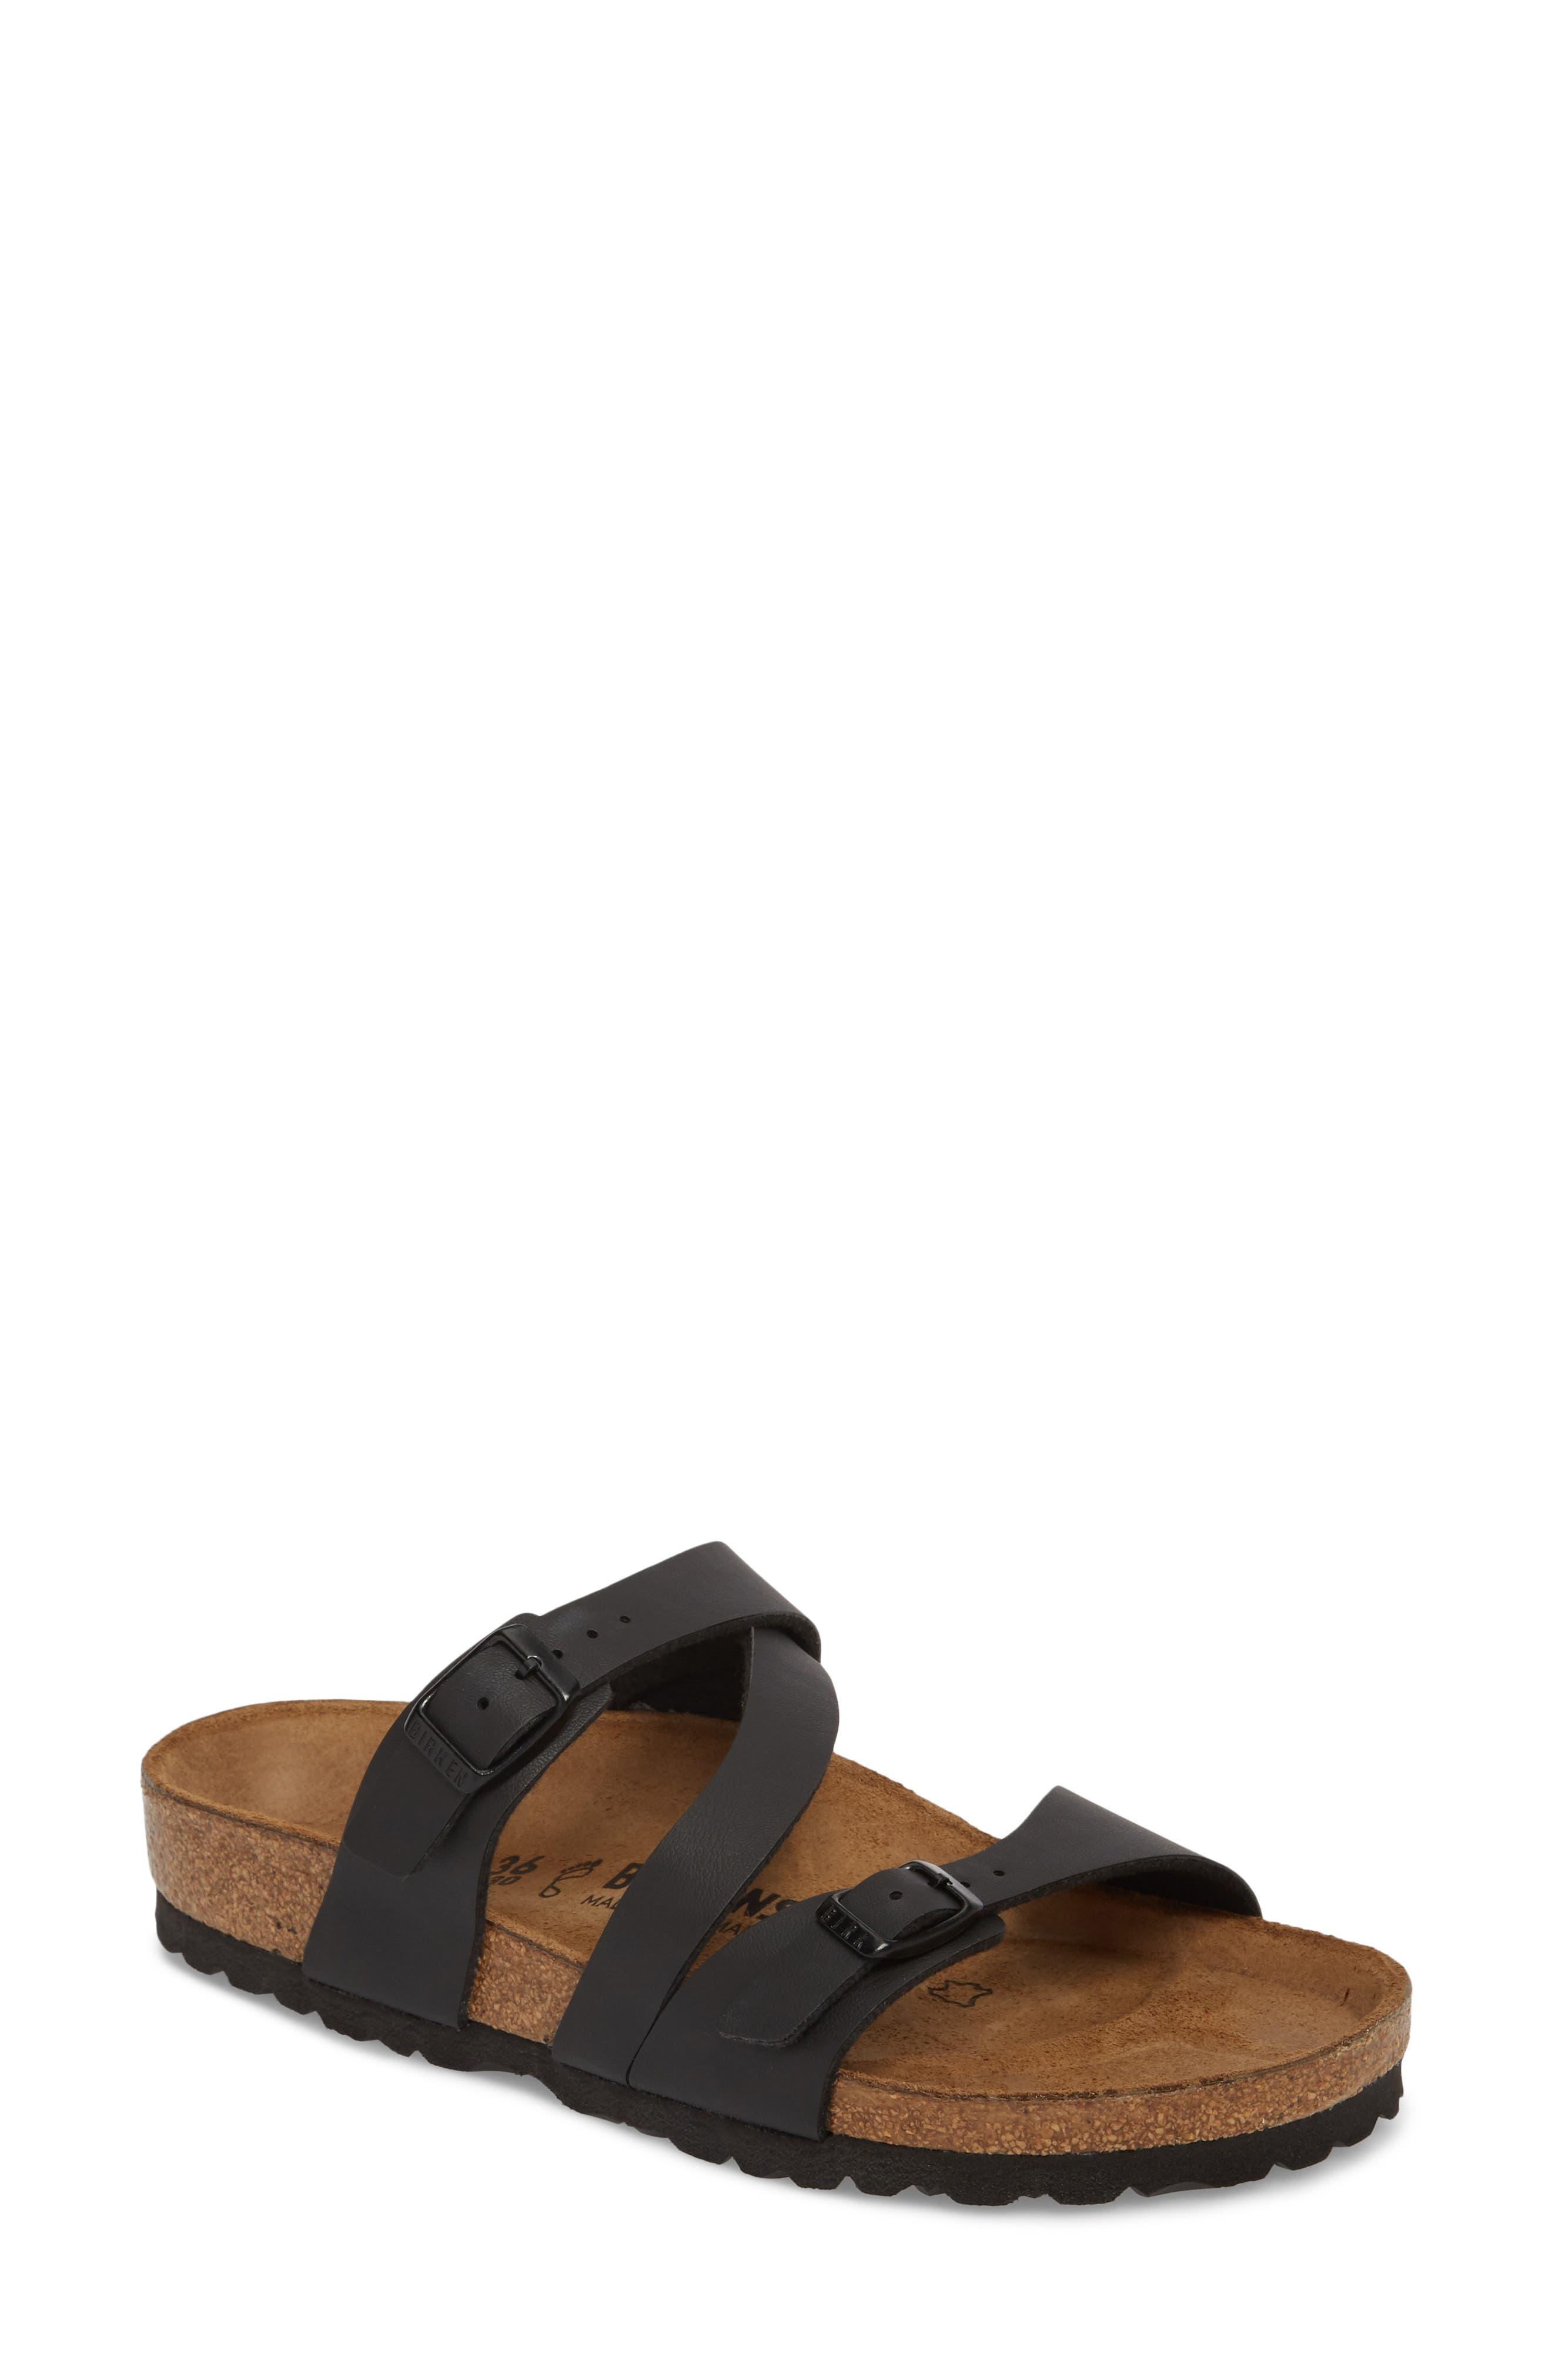 Birkenstock Salina Slide Sandal, Black